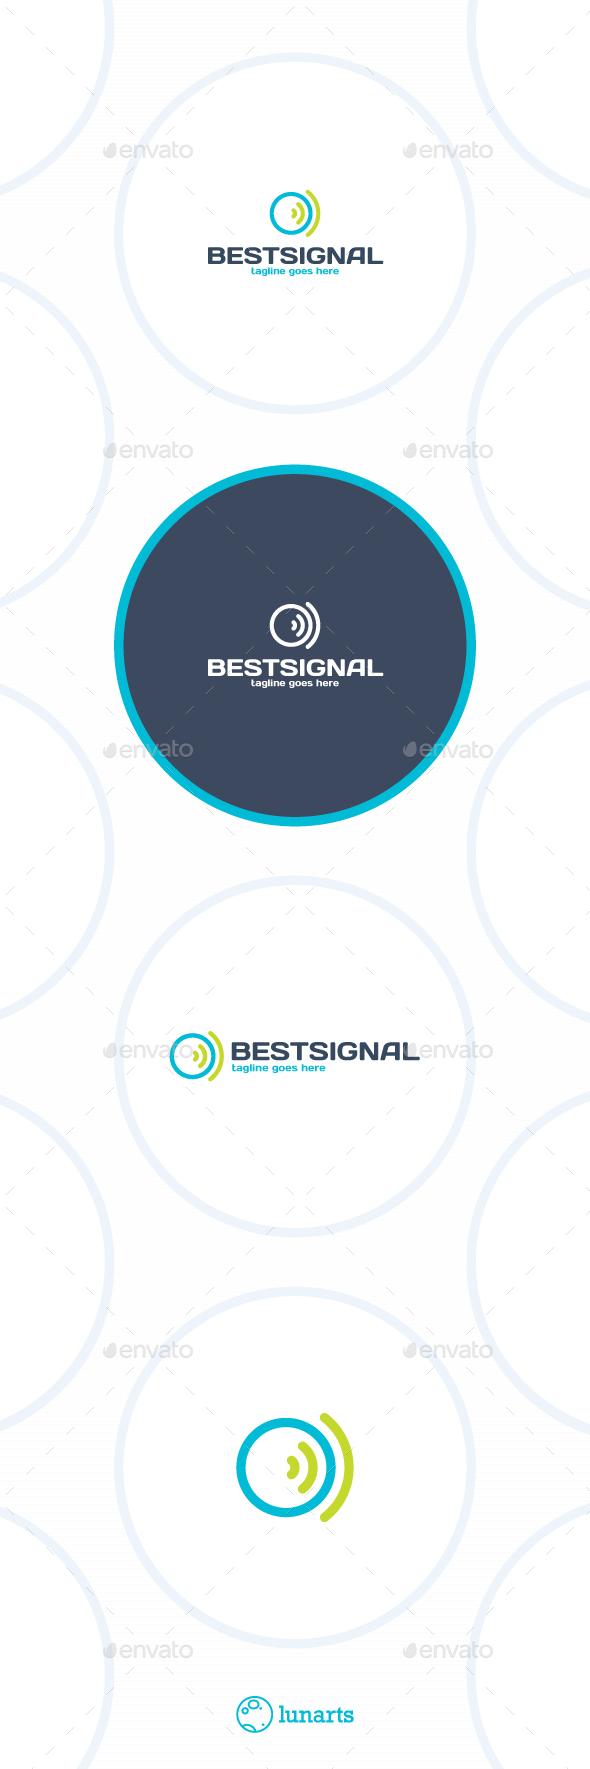 Best Signal Logo - Circle Wireless - Symbols Logo Templates